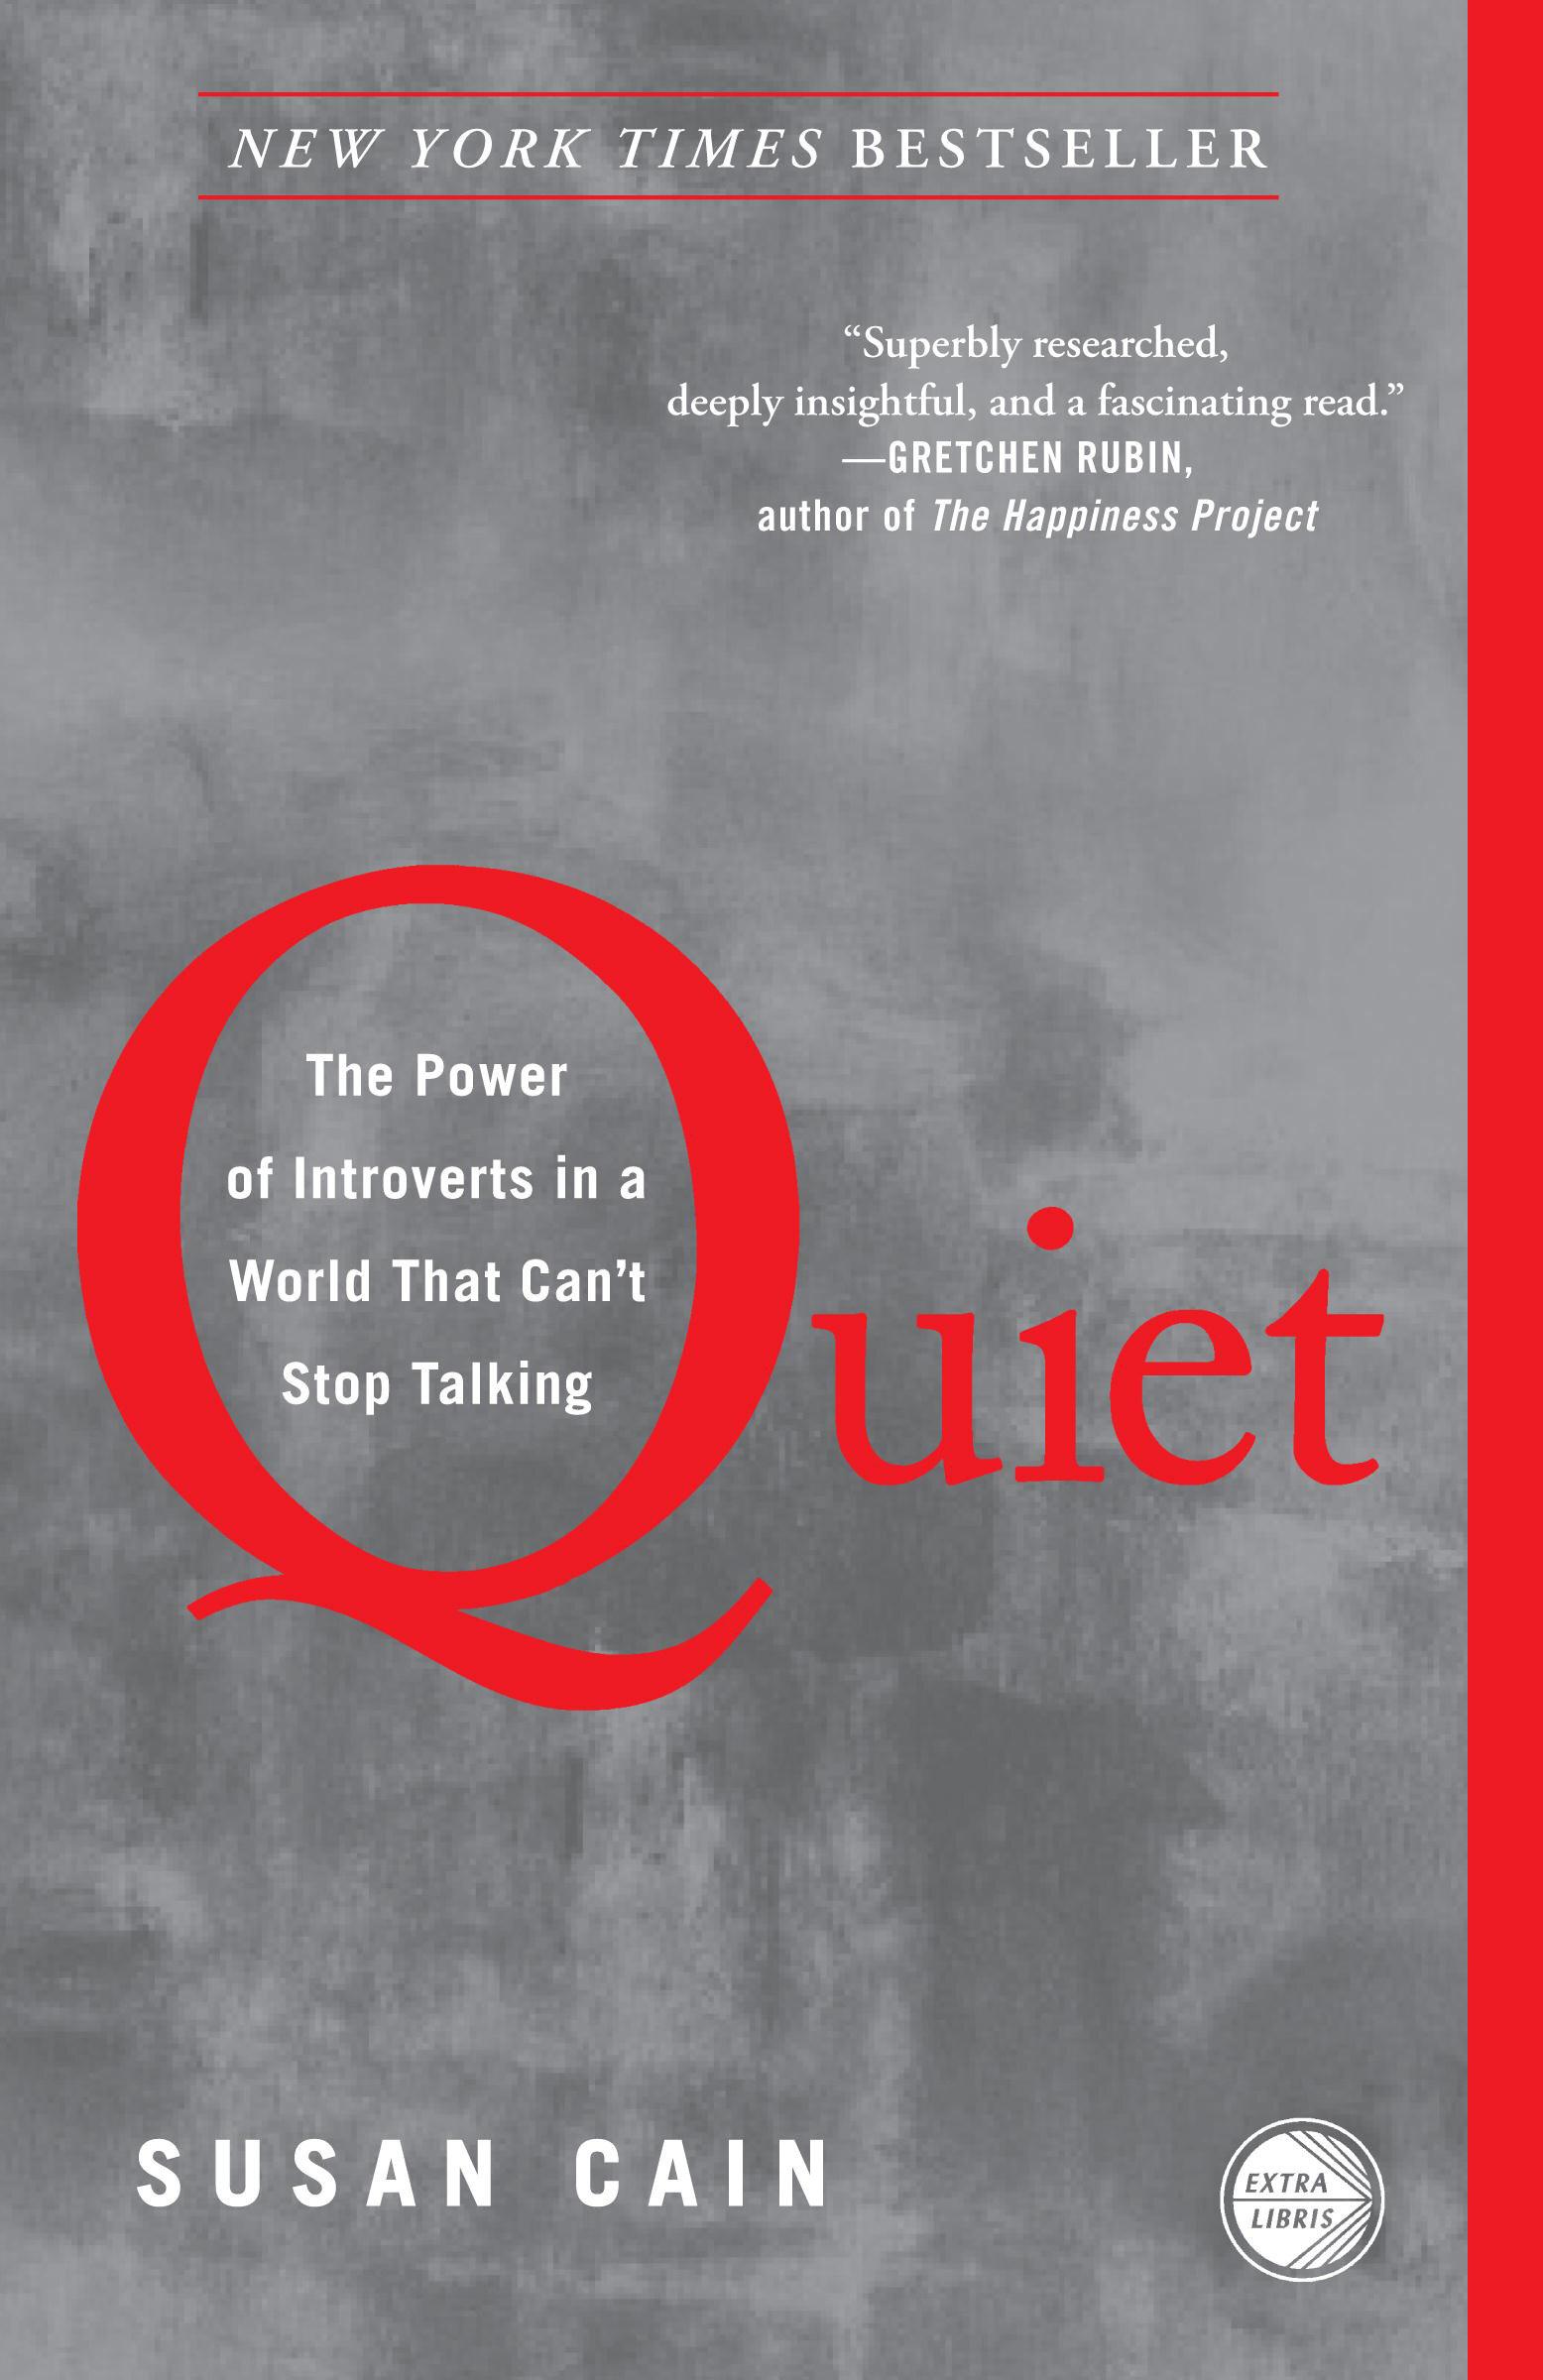 QUIET_paperback_High-Res_Jacket1.jpg